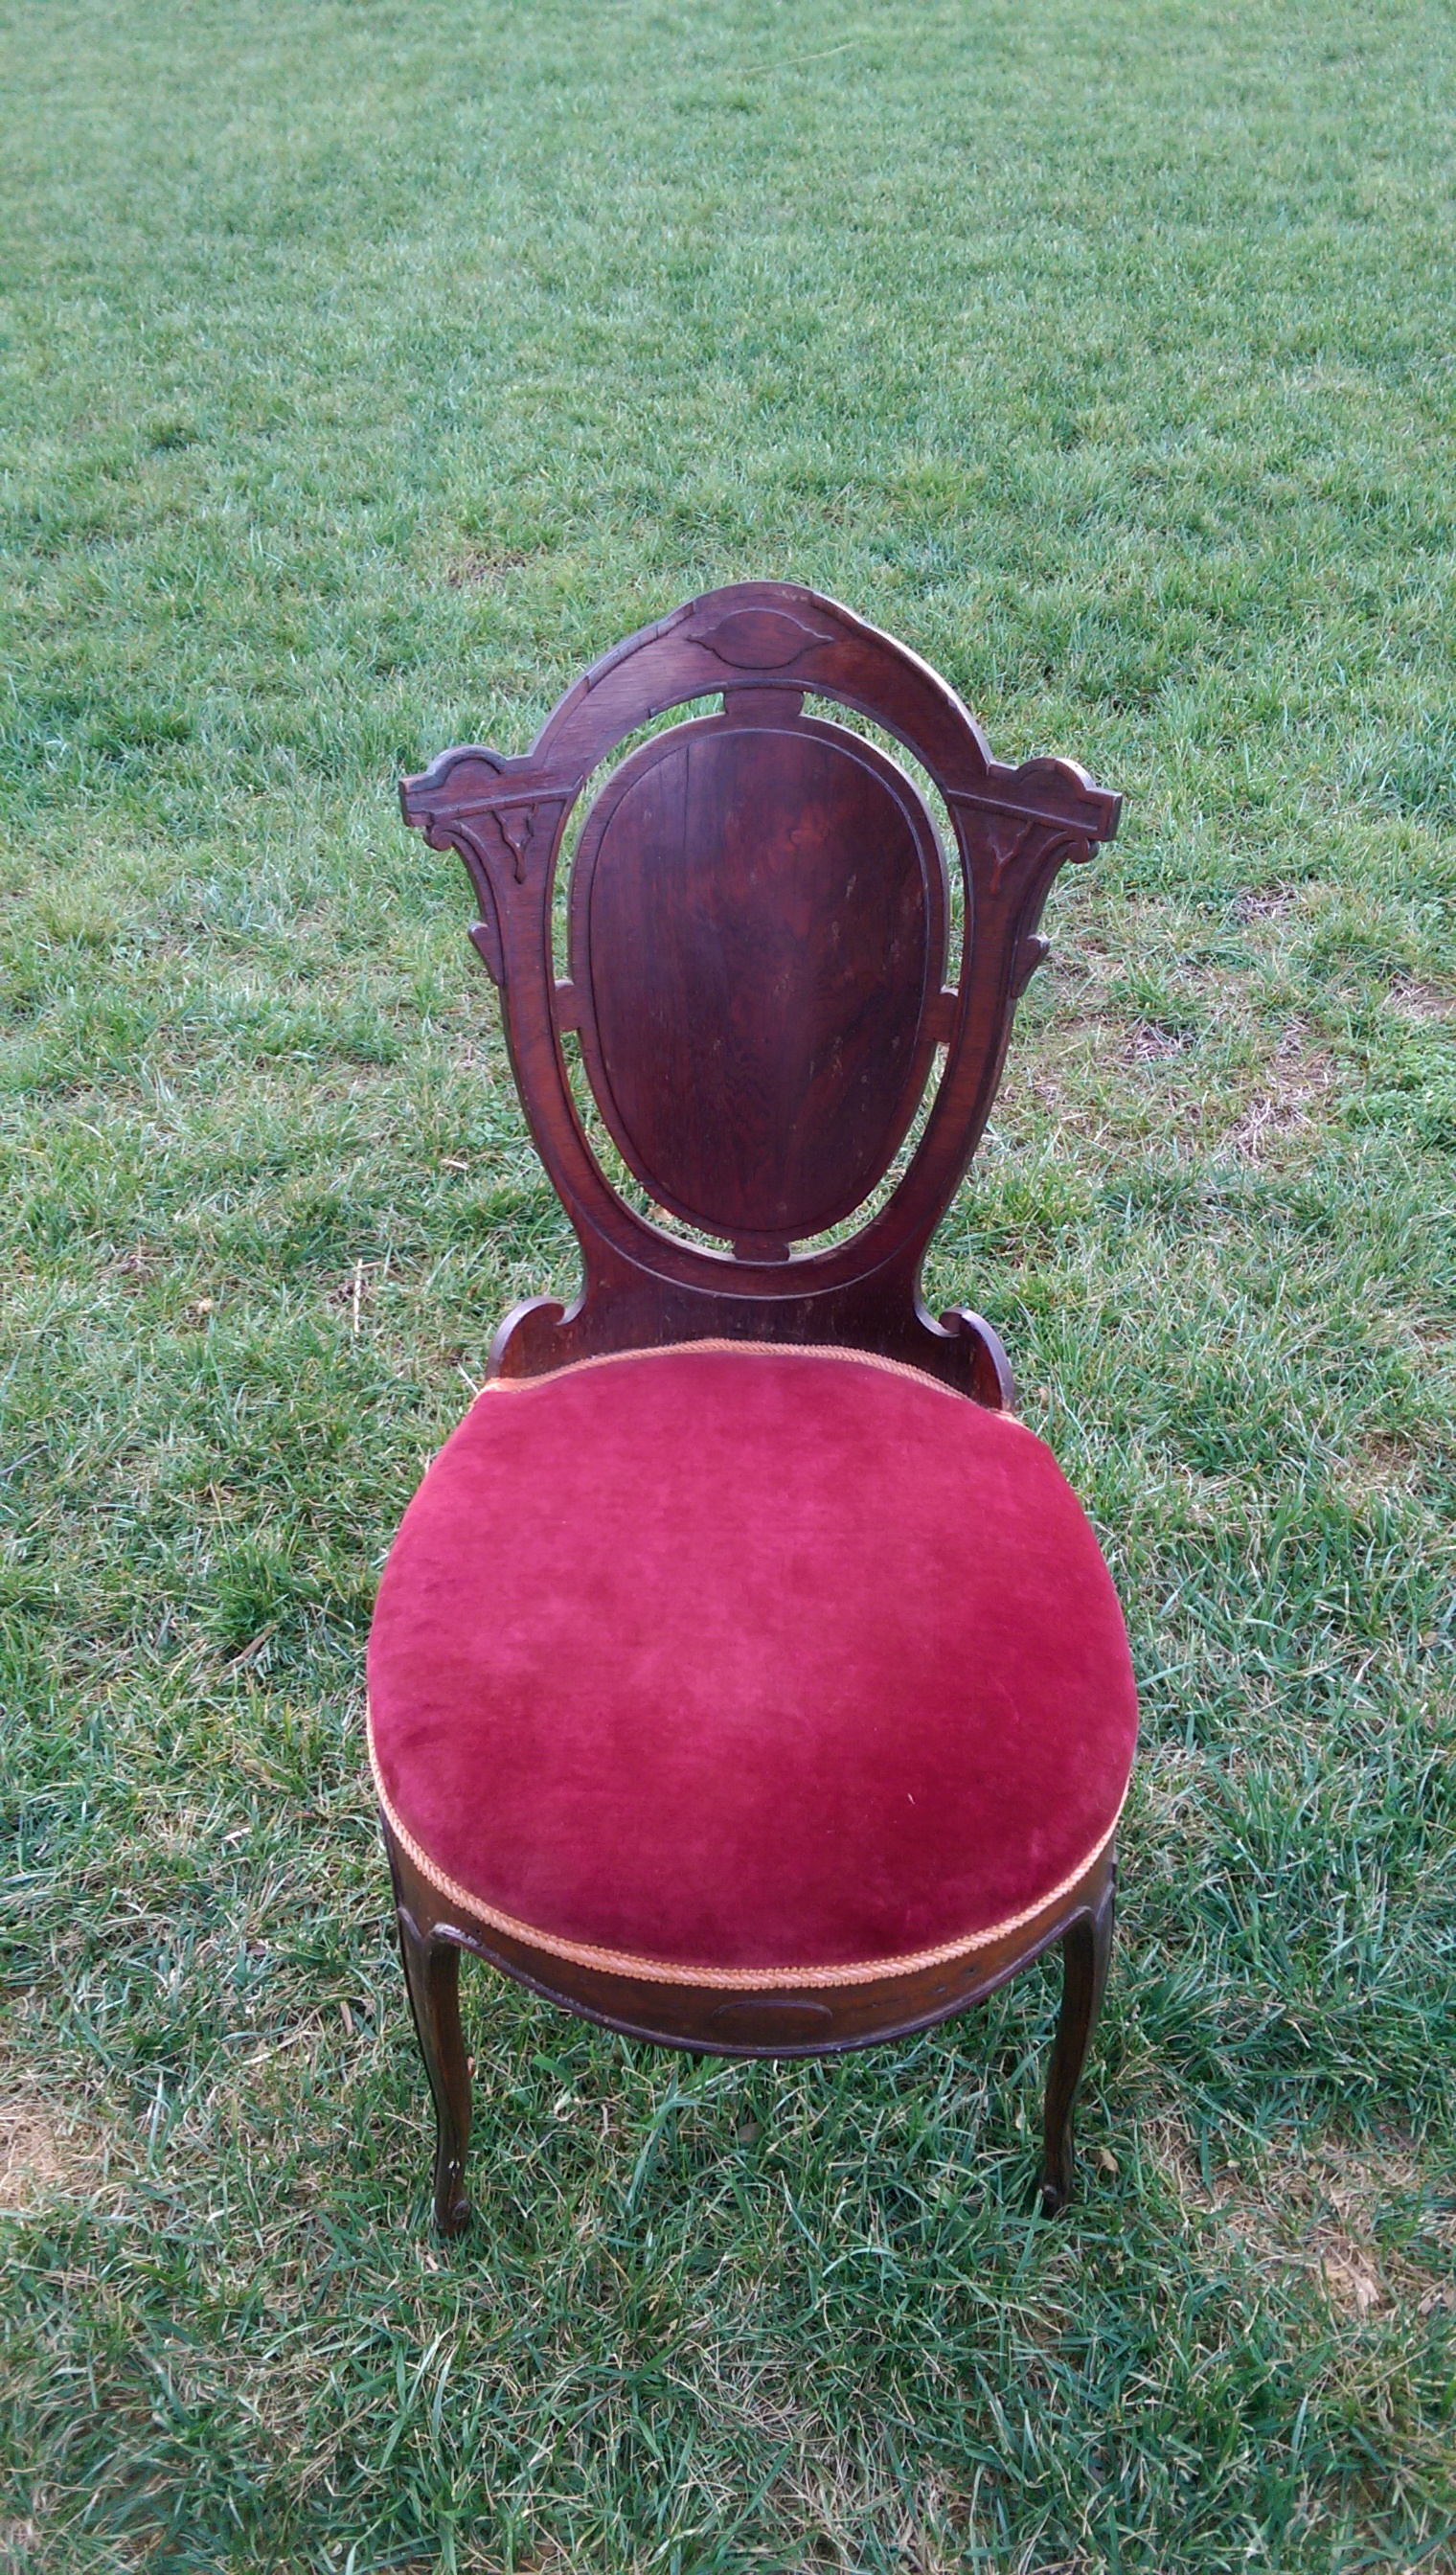 burgundy chair 2.jpg